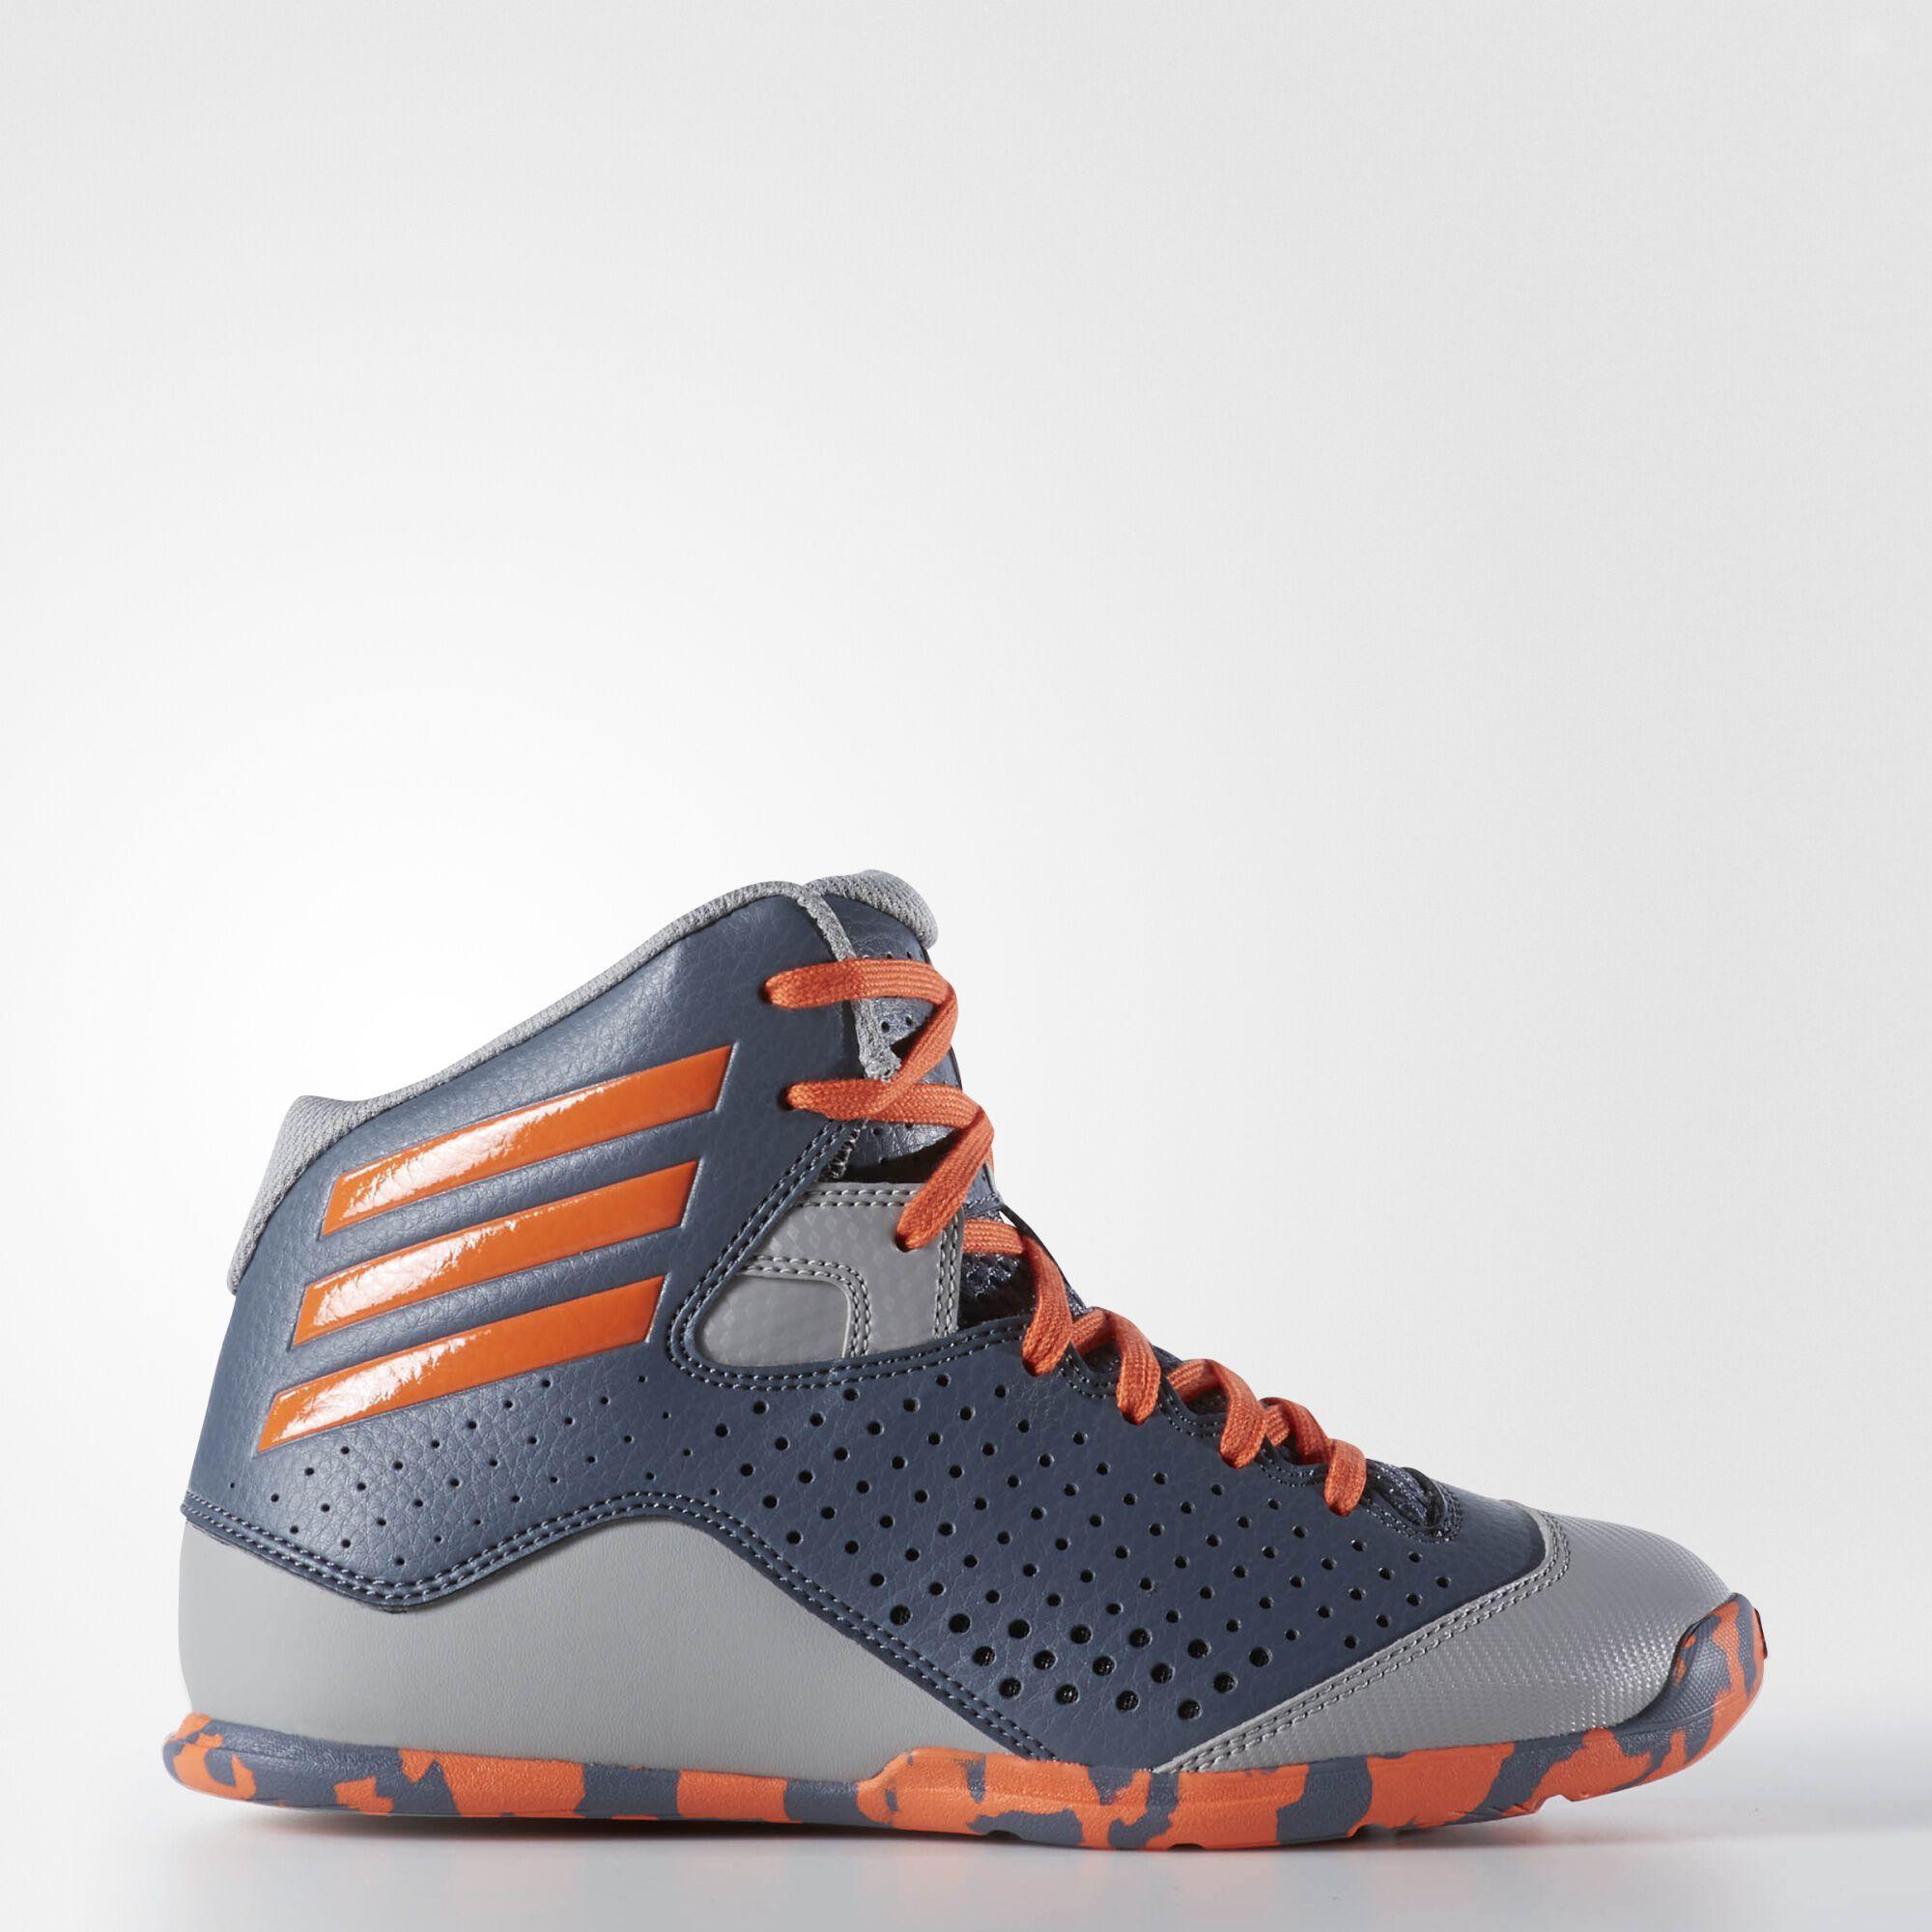 Adidas Female Basketball Shoes